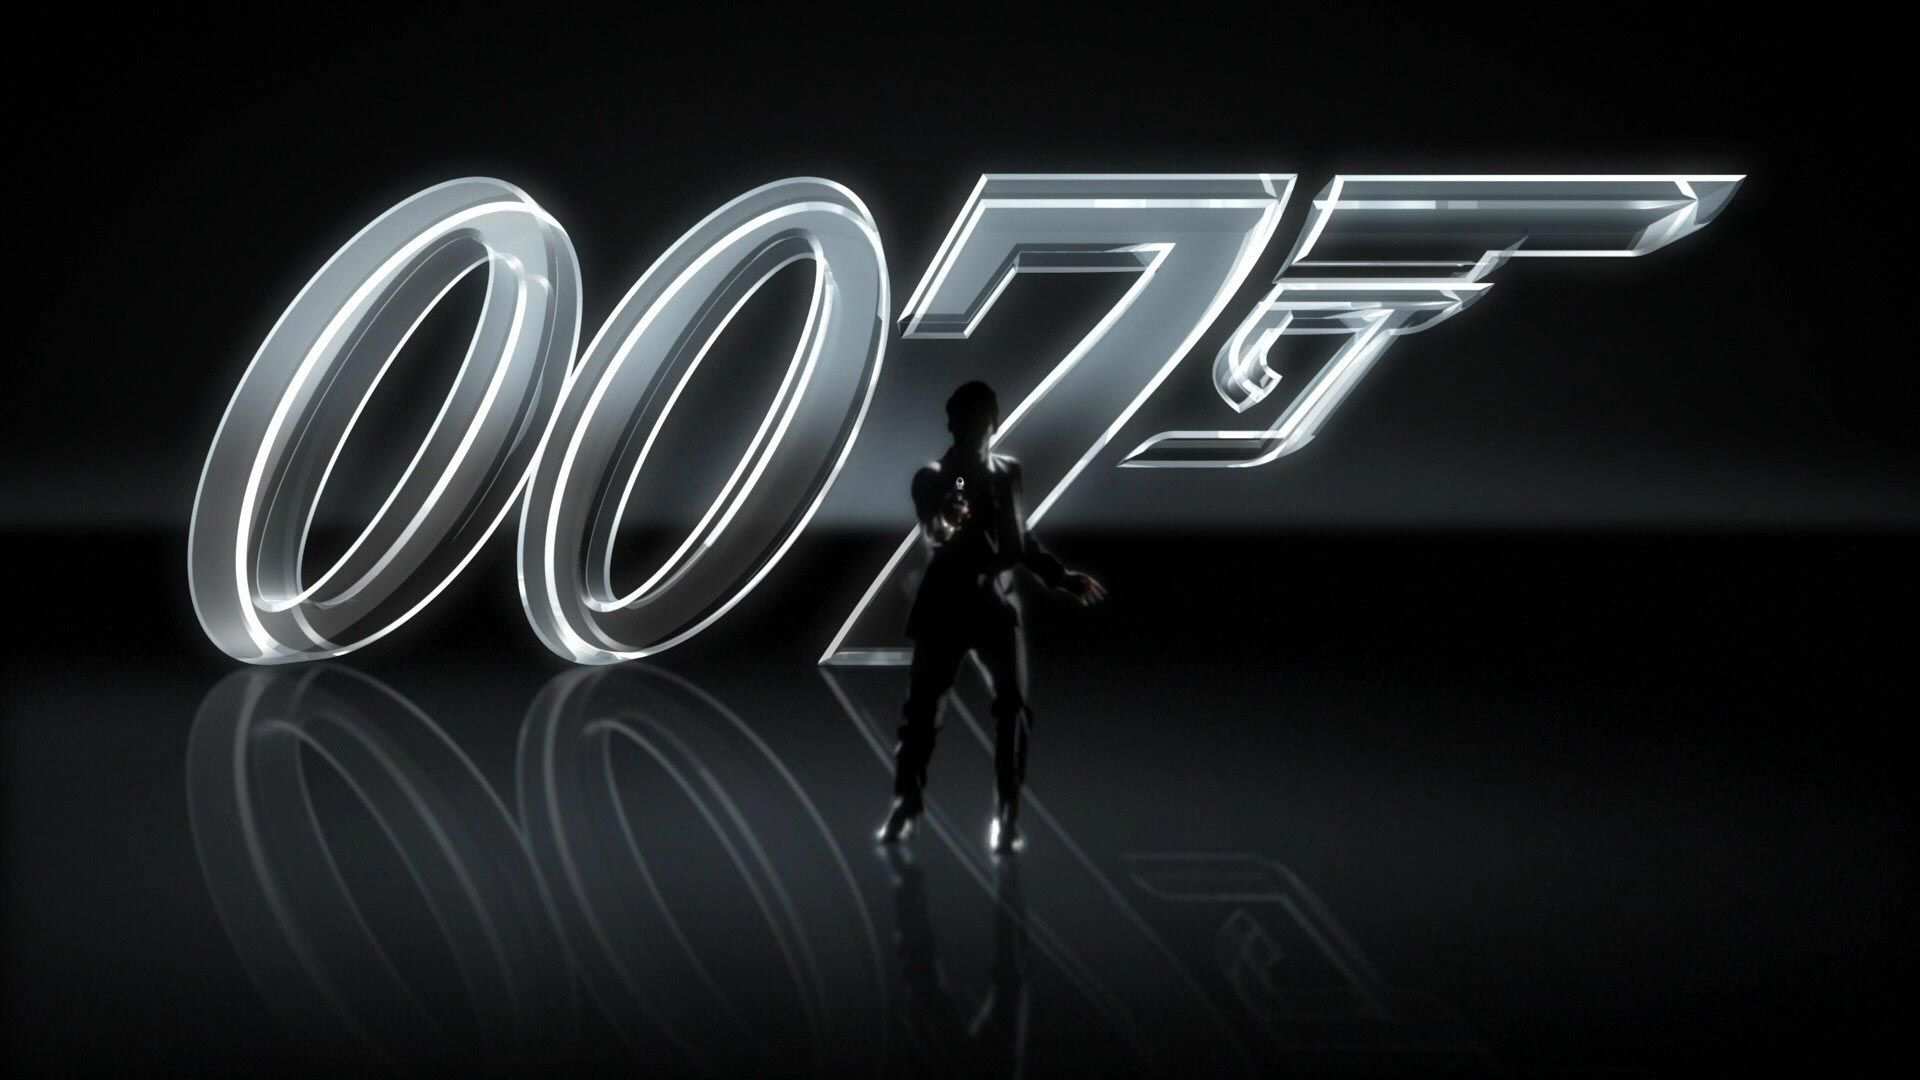 James Bond 007 Wallpapers Wallpaper Cave James Bond James Bond Movies Bond Movies